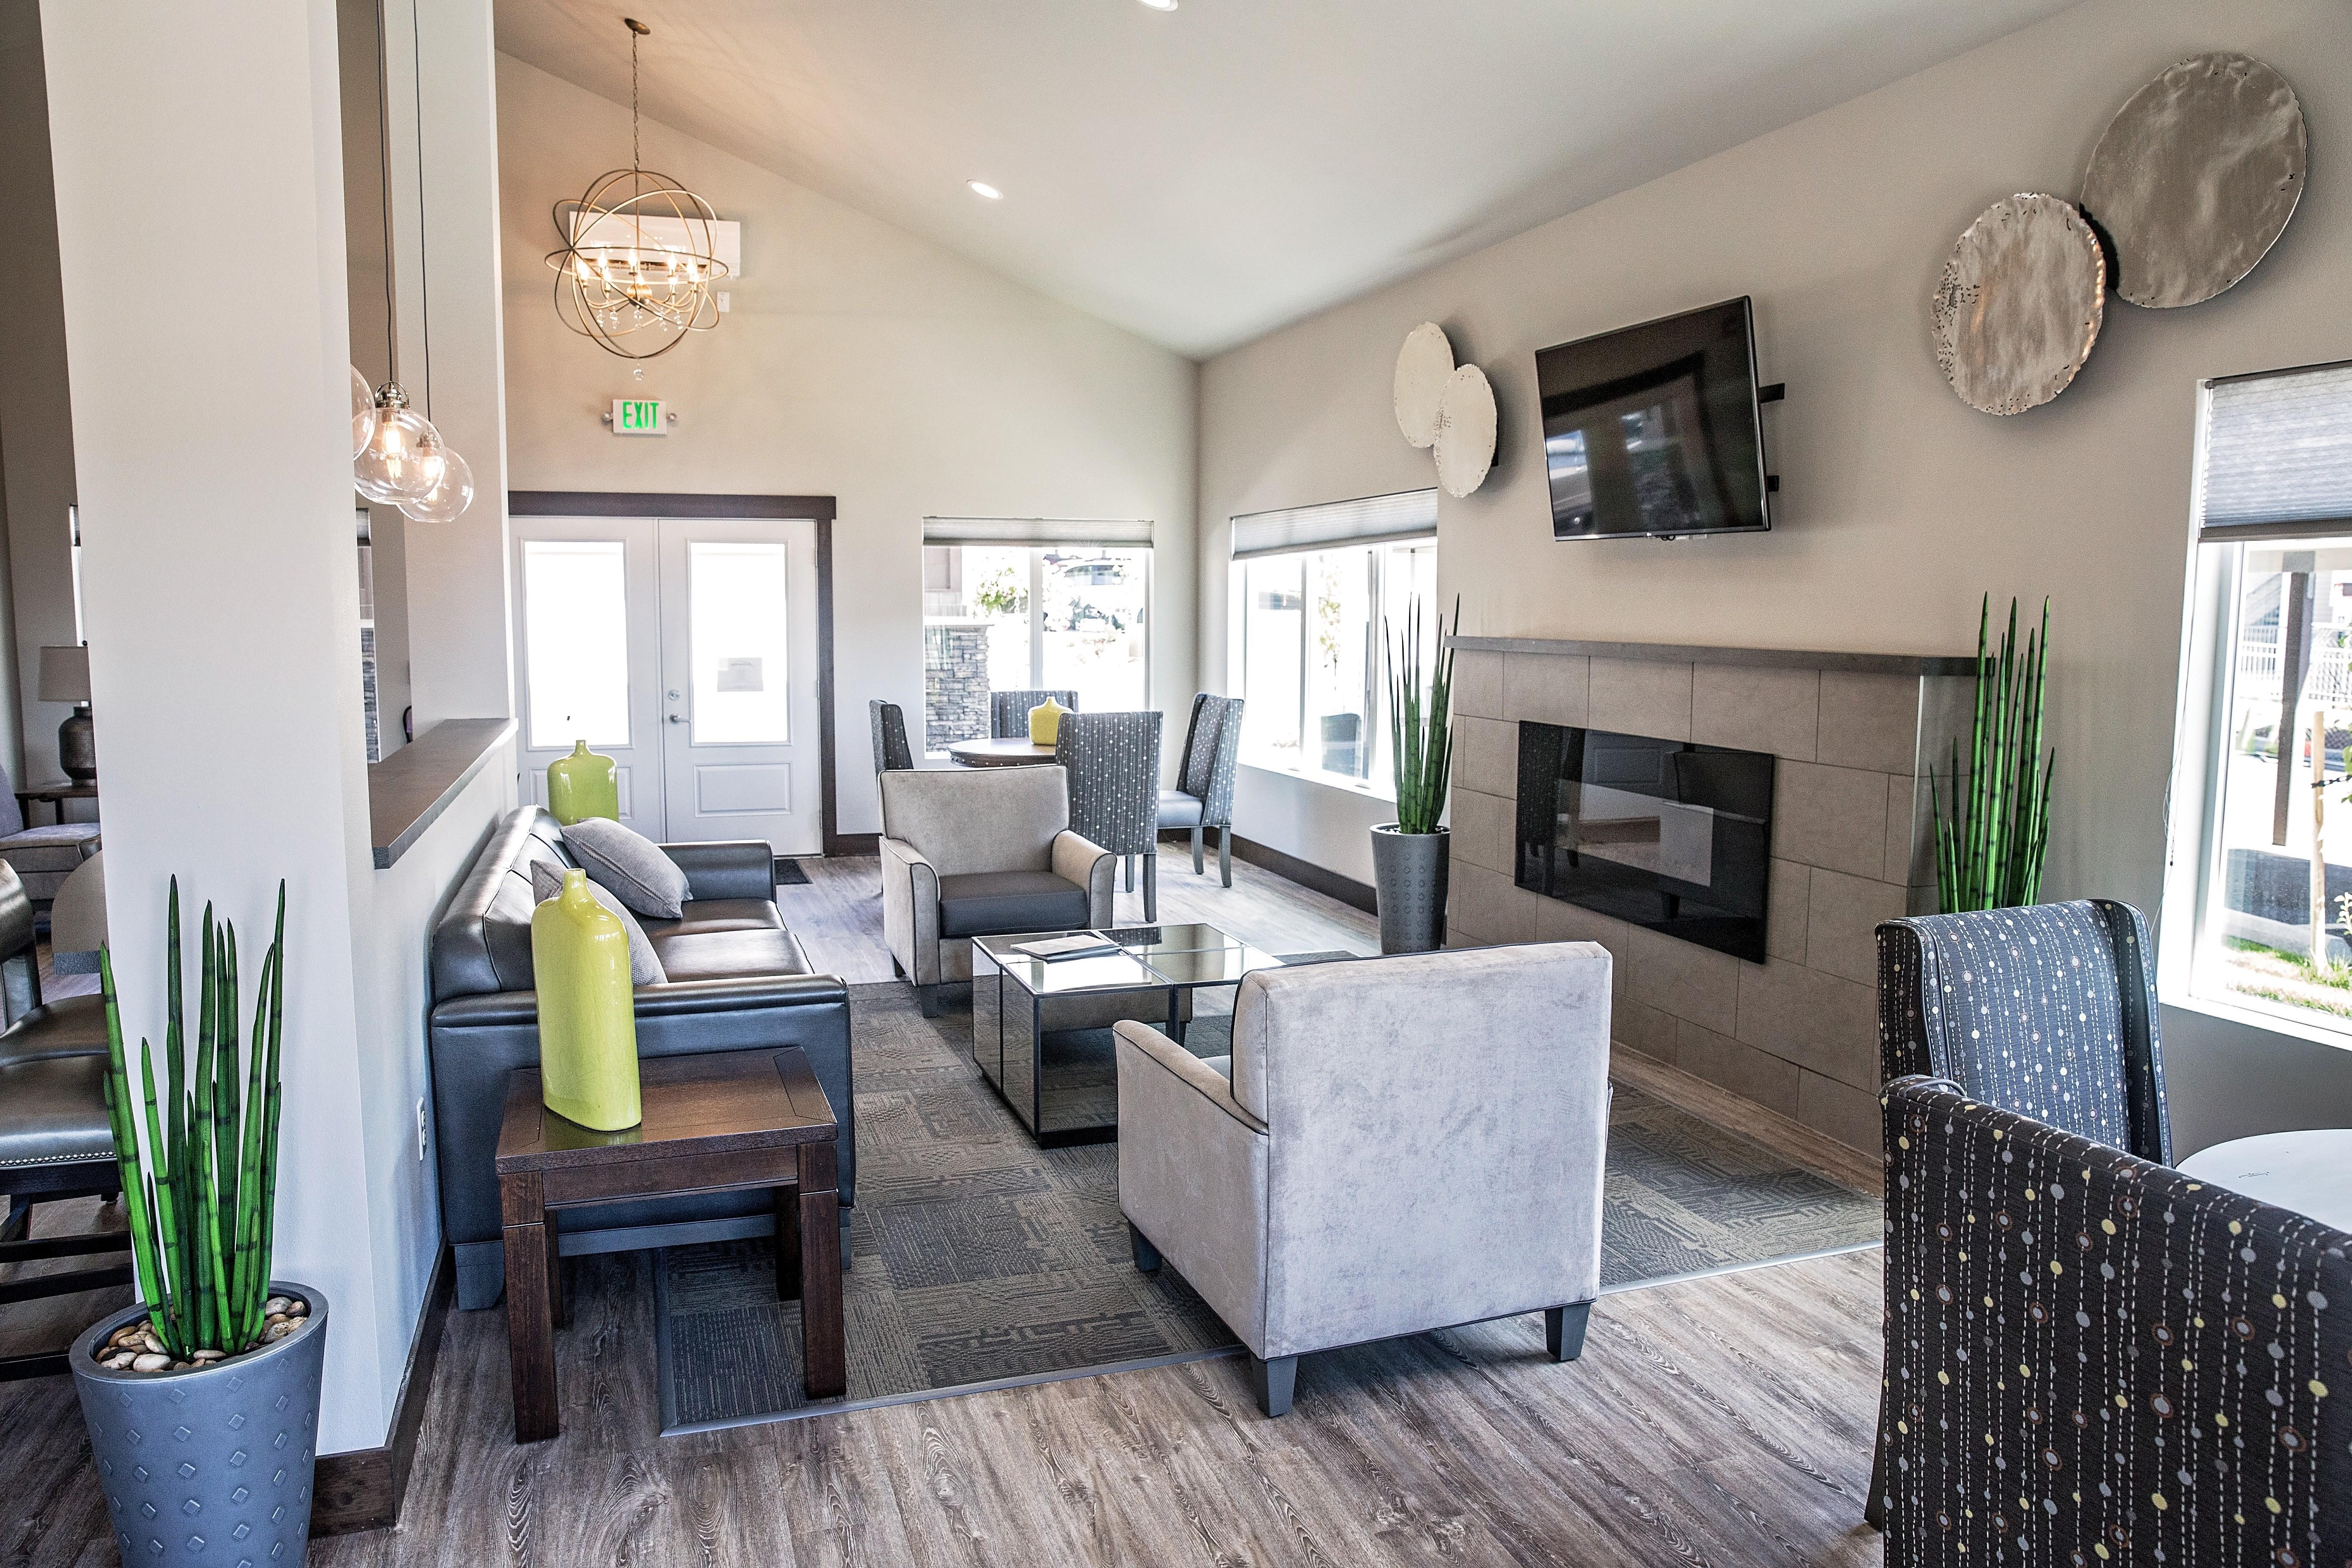 54 Apartments for Rent in Post Falls ID Zumper